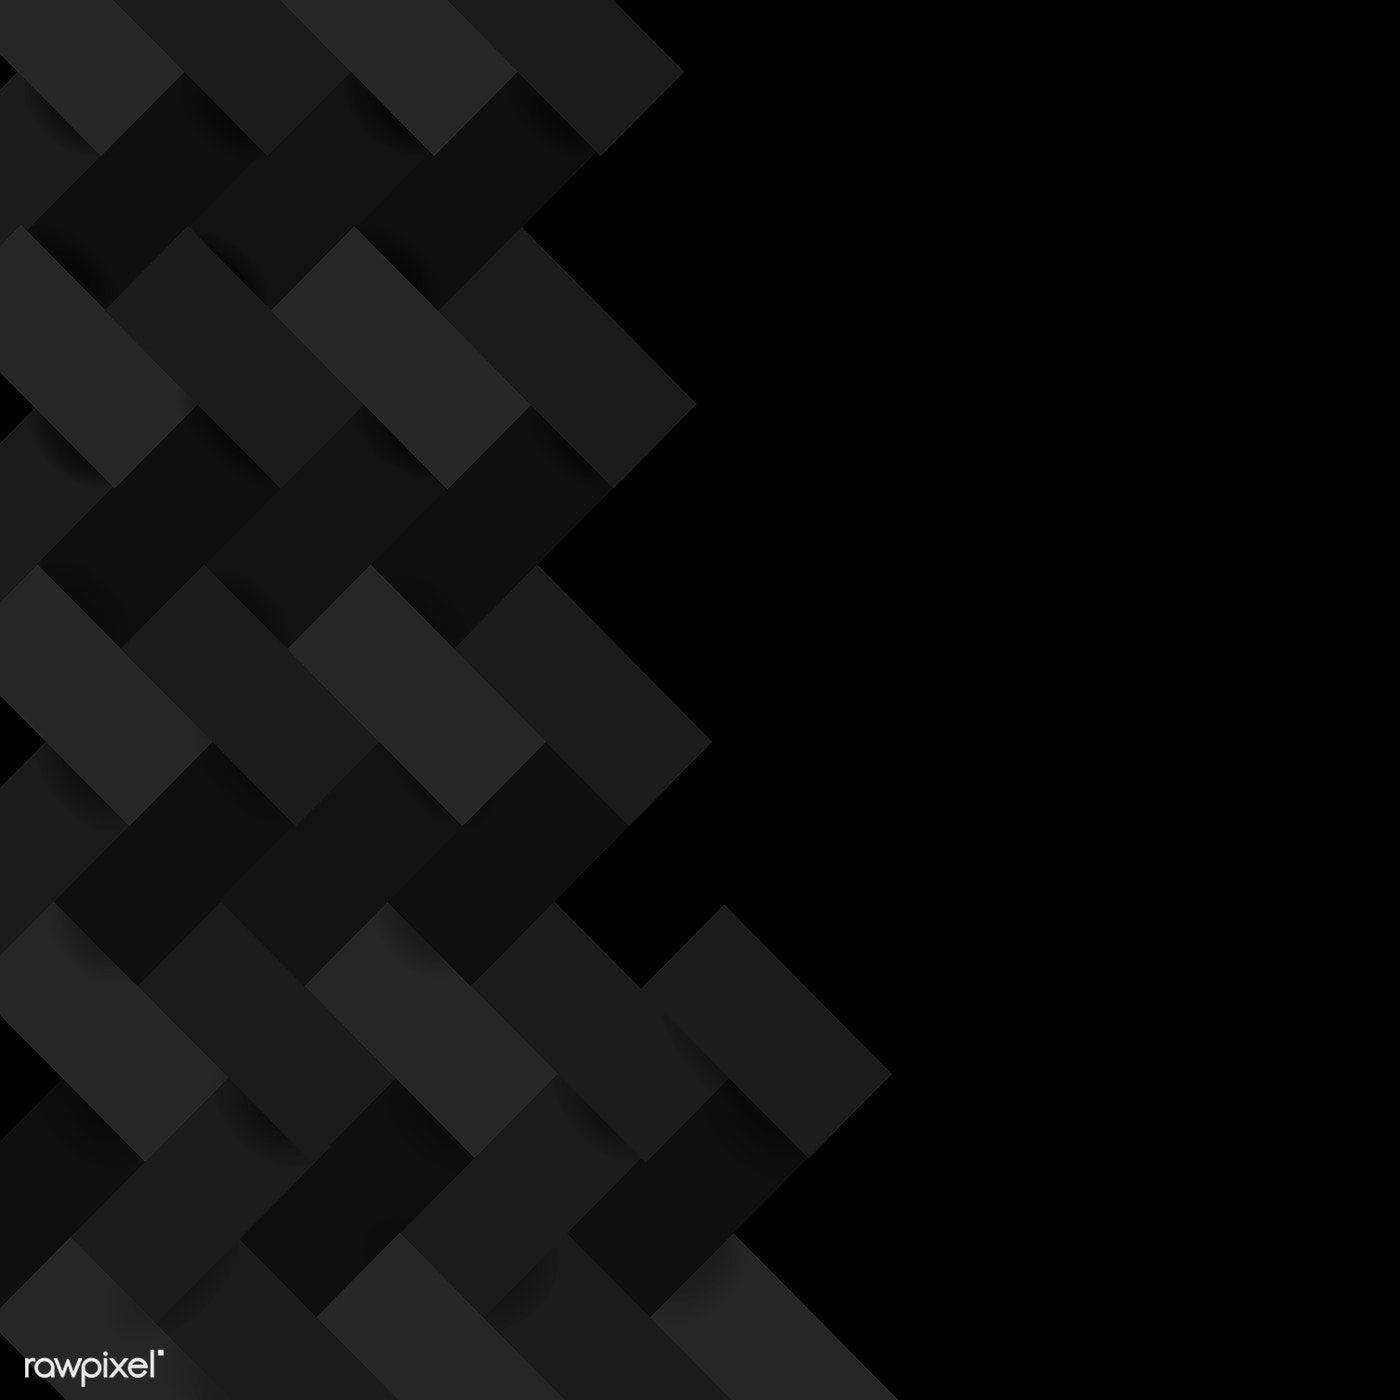 Black Modern Background Design Vector